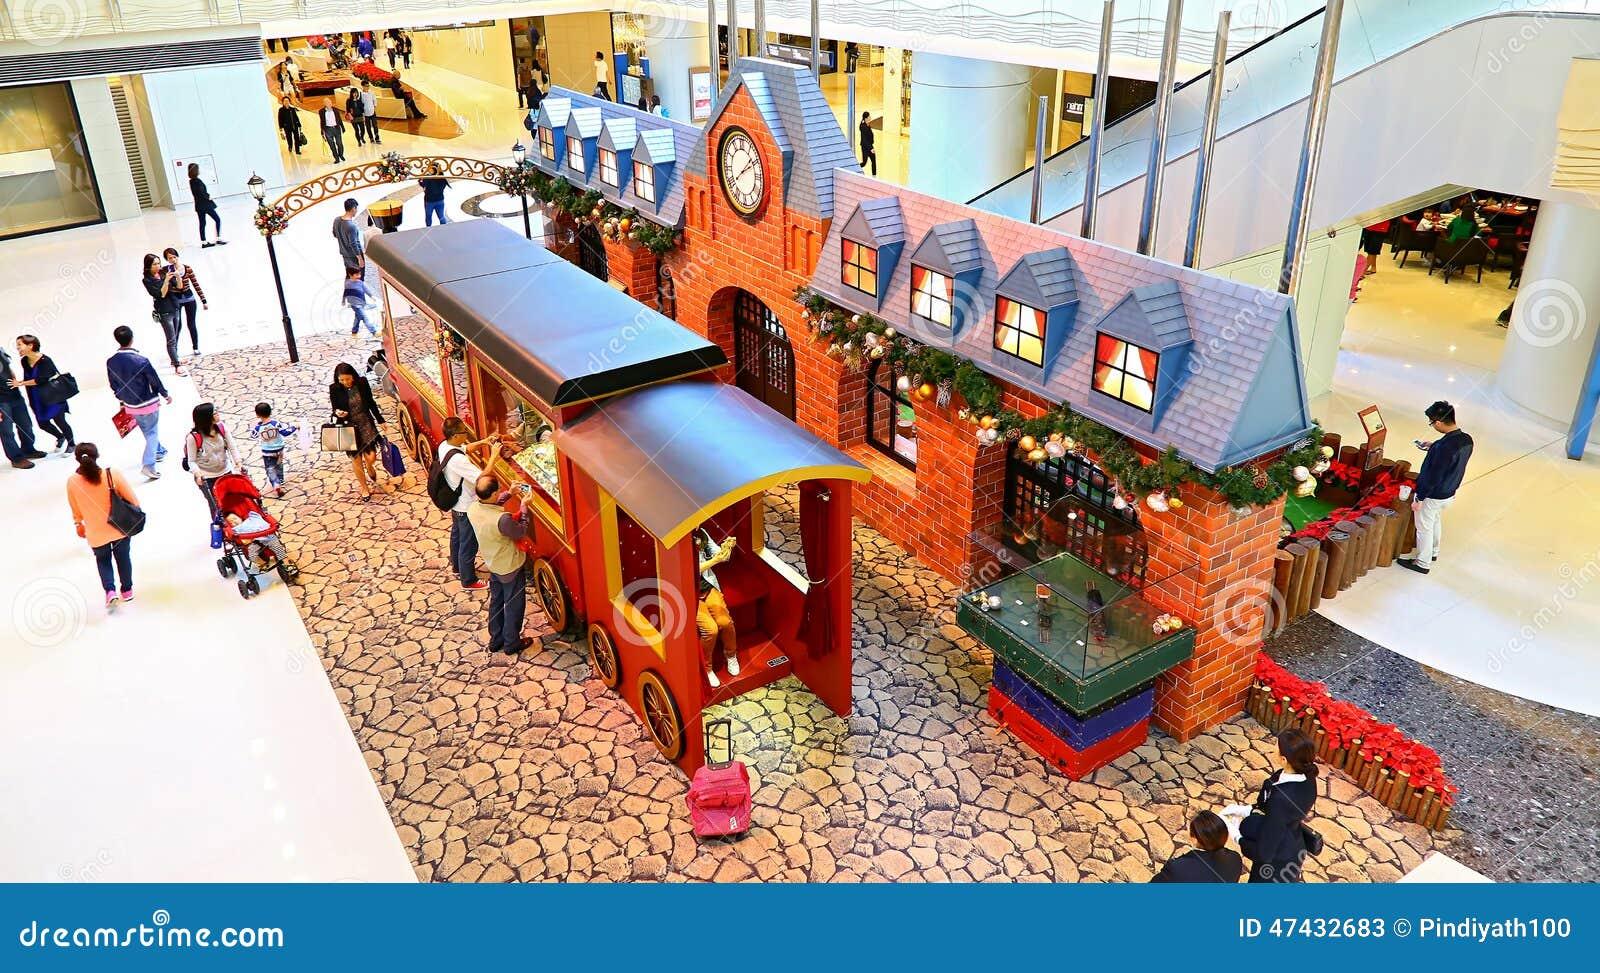 Christmas Display Decorations